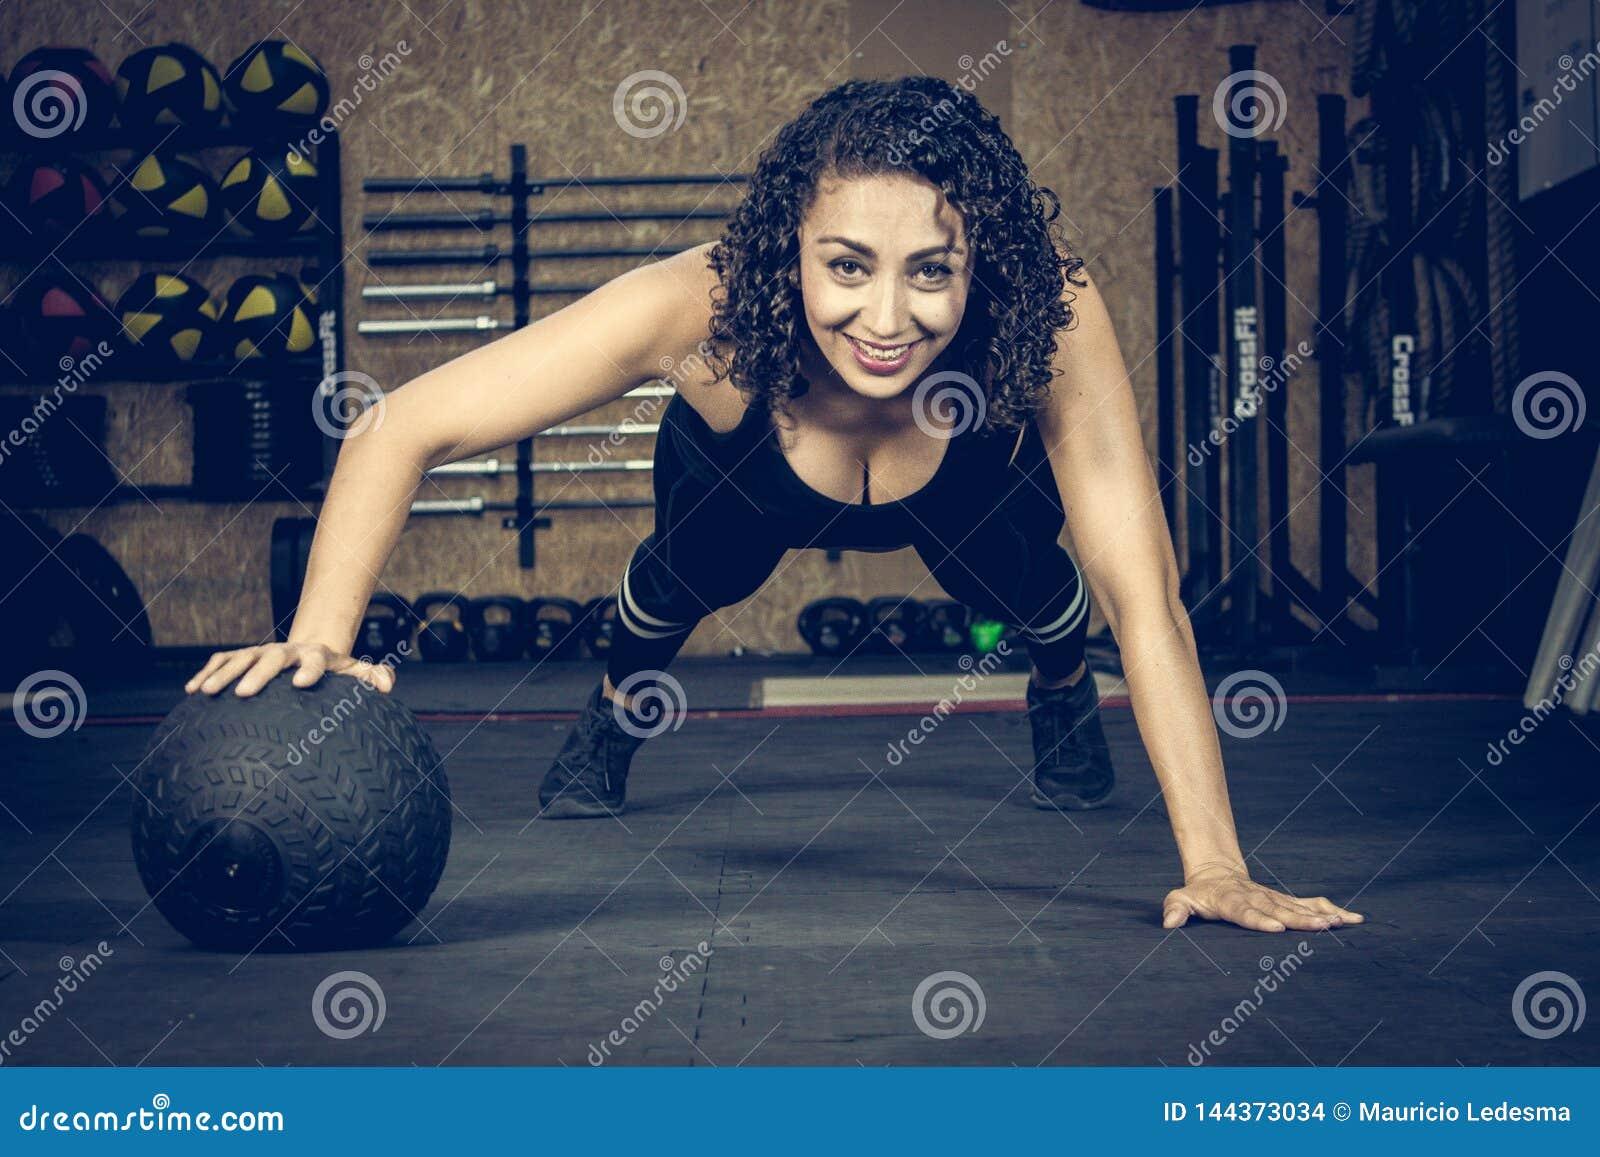 Crossfitter training hard daily wod ball